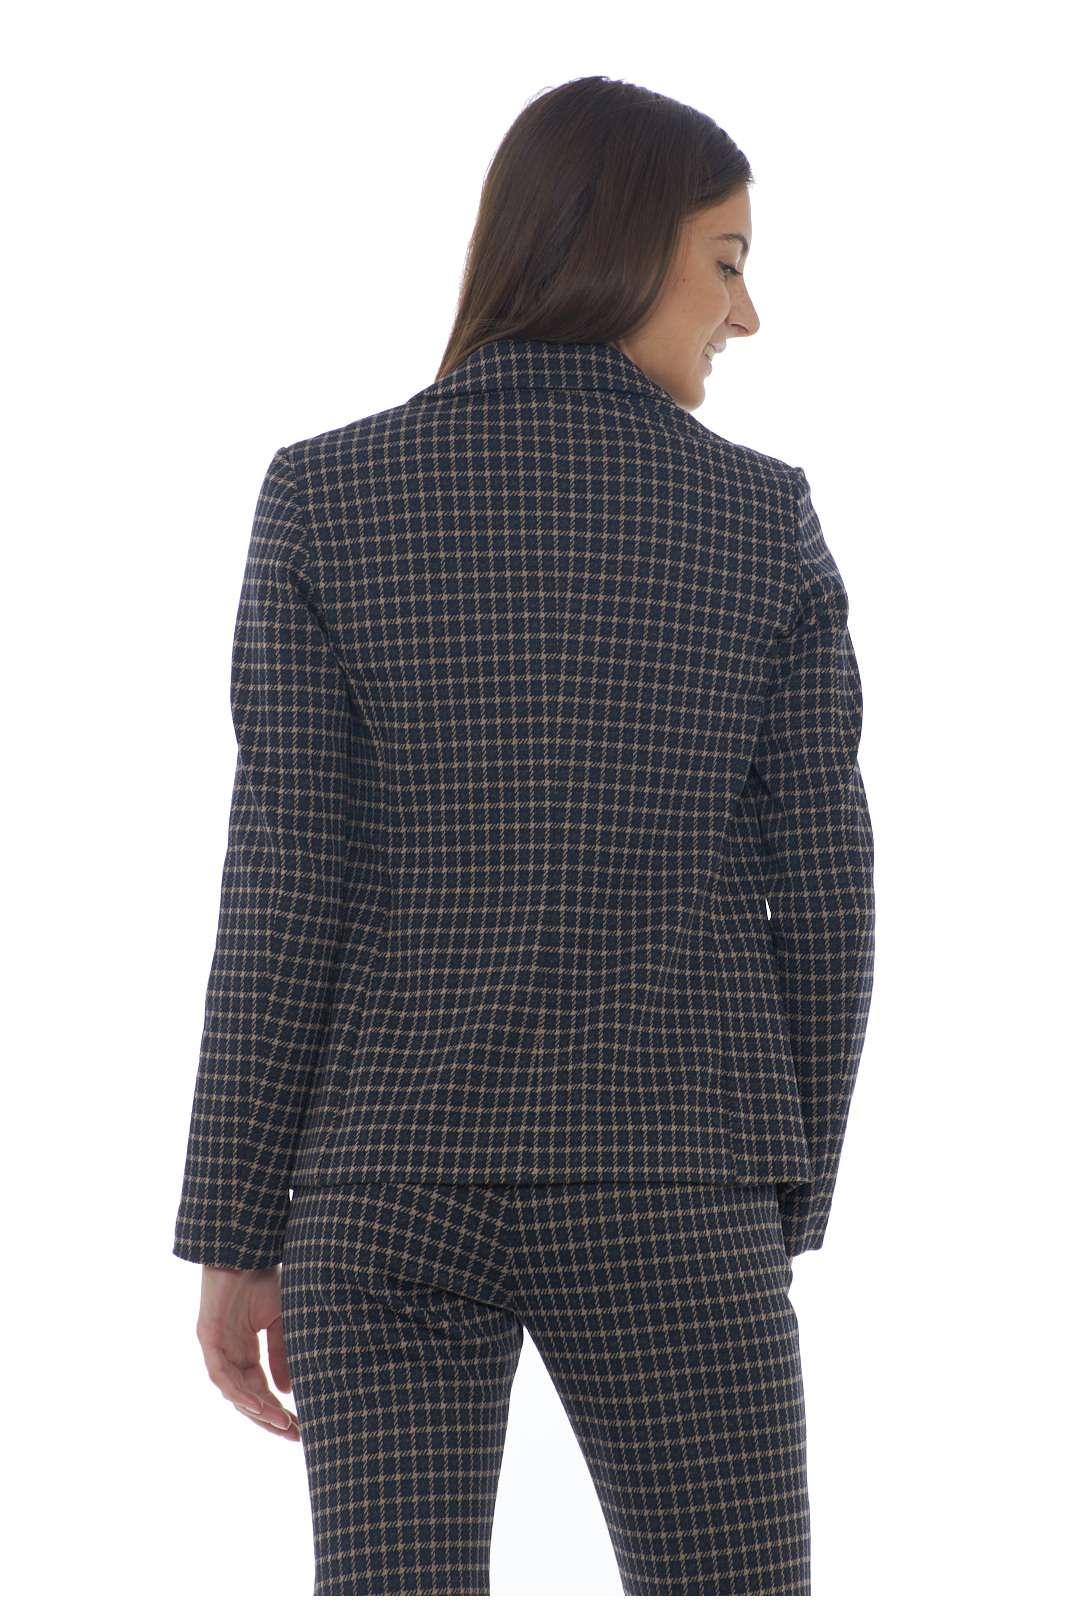 https://www.parmax.com/media/catalog/product/a/i/AI-outlet_parmax-giacca-donna-MaxMara-59160393-C.jpg